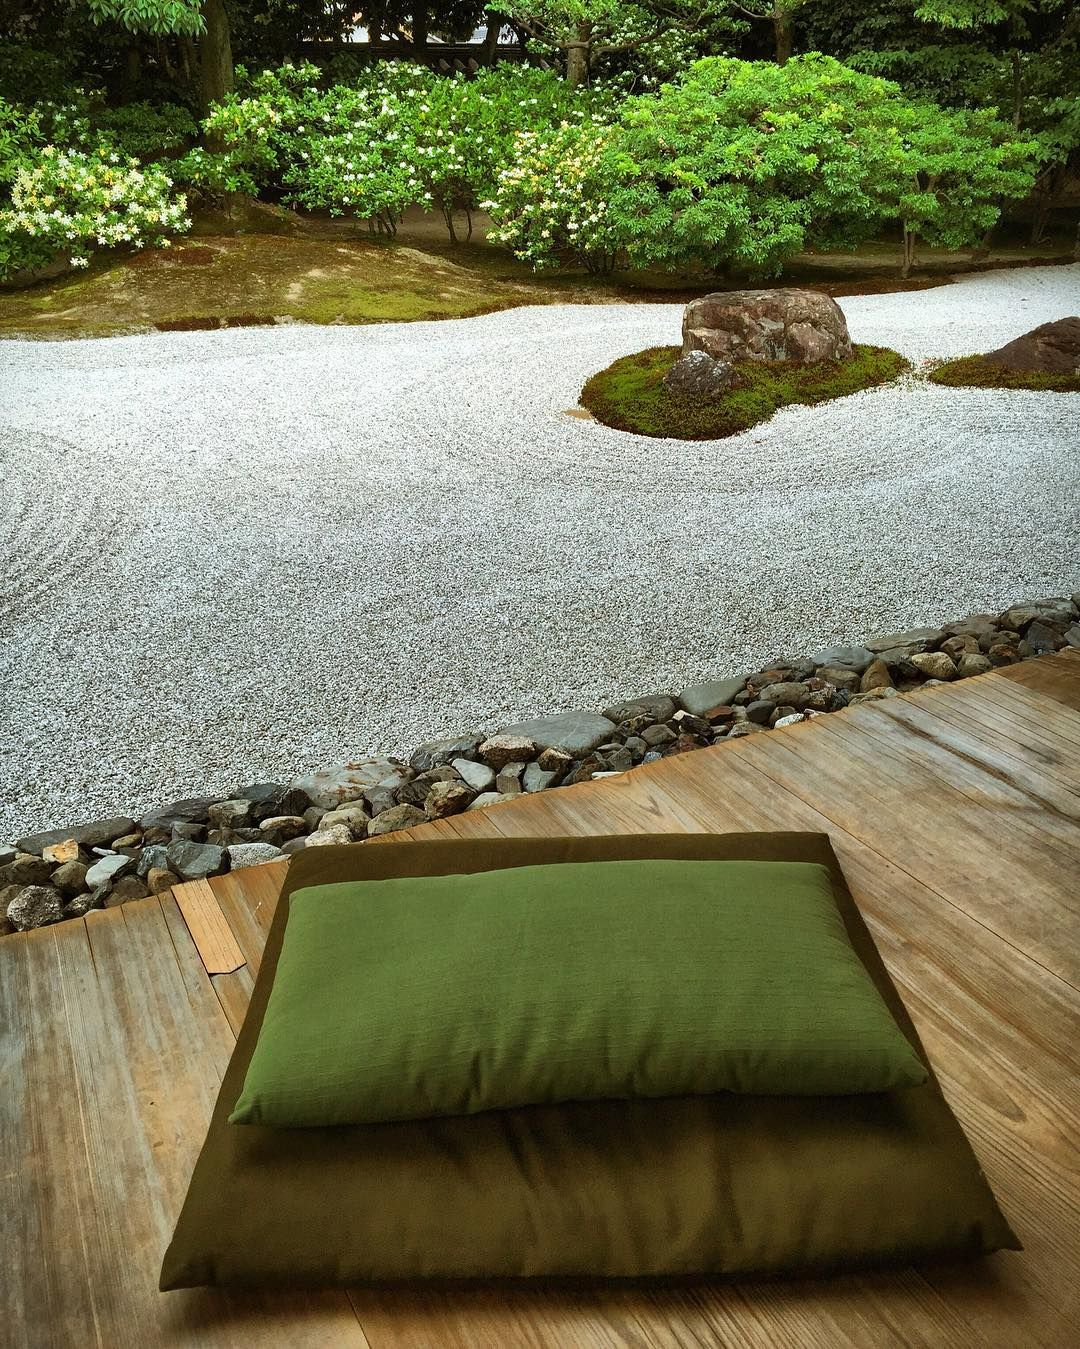 Zen Meditation At Kennin Ji Temple